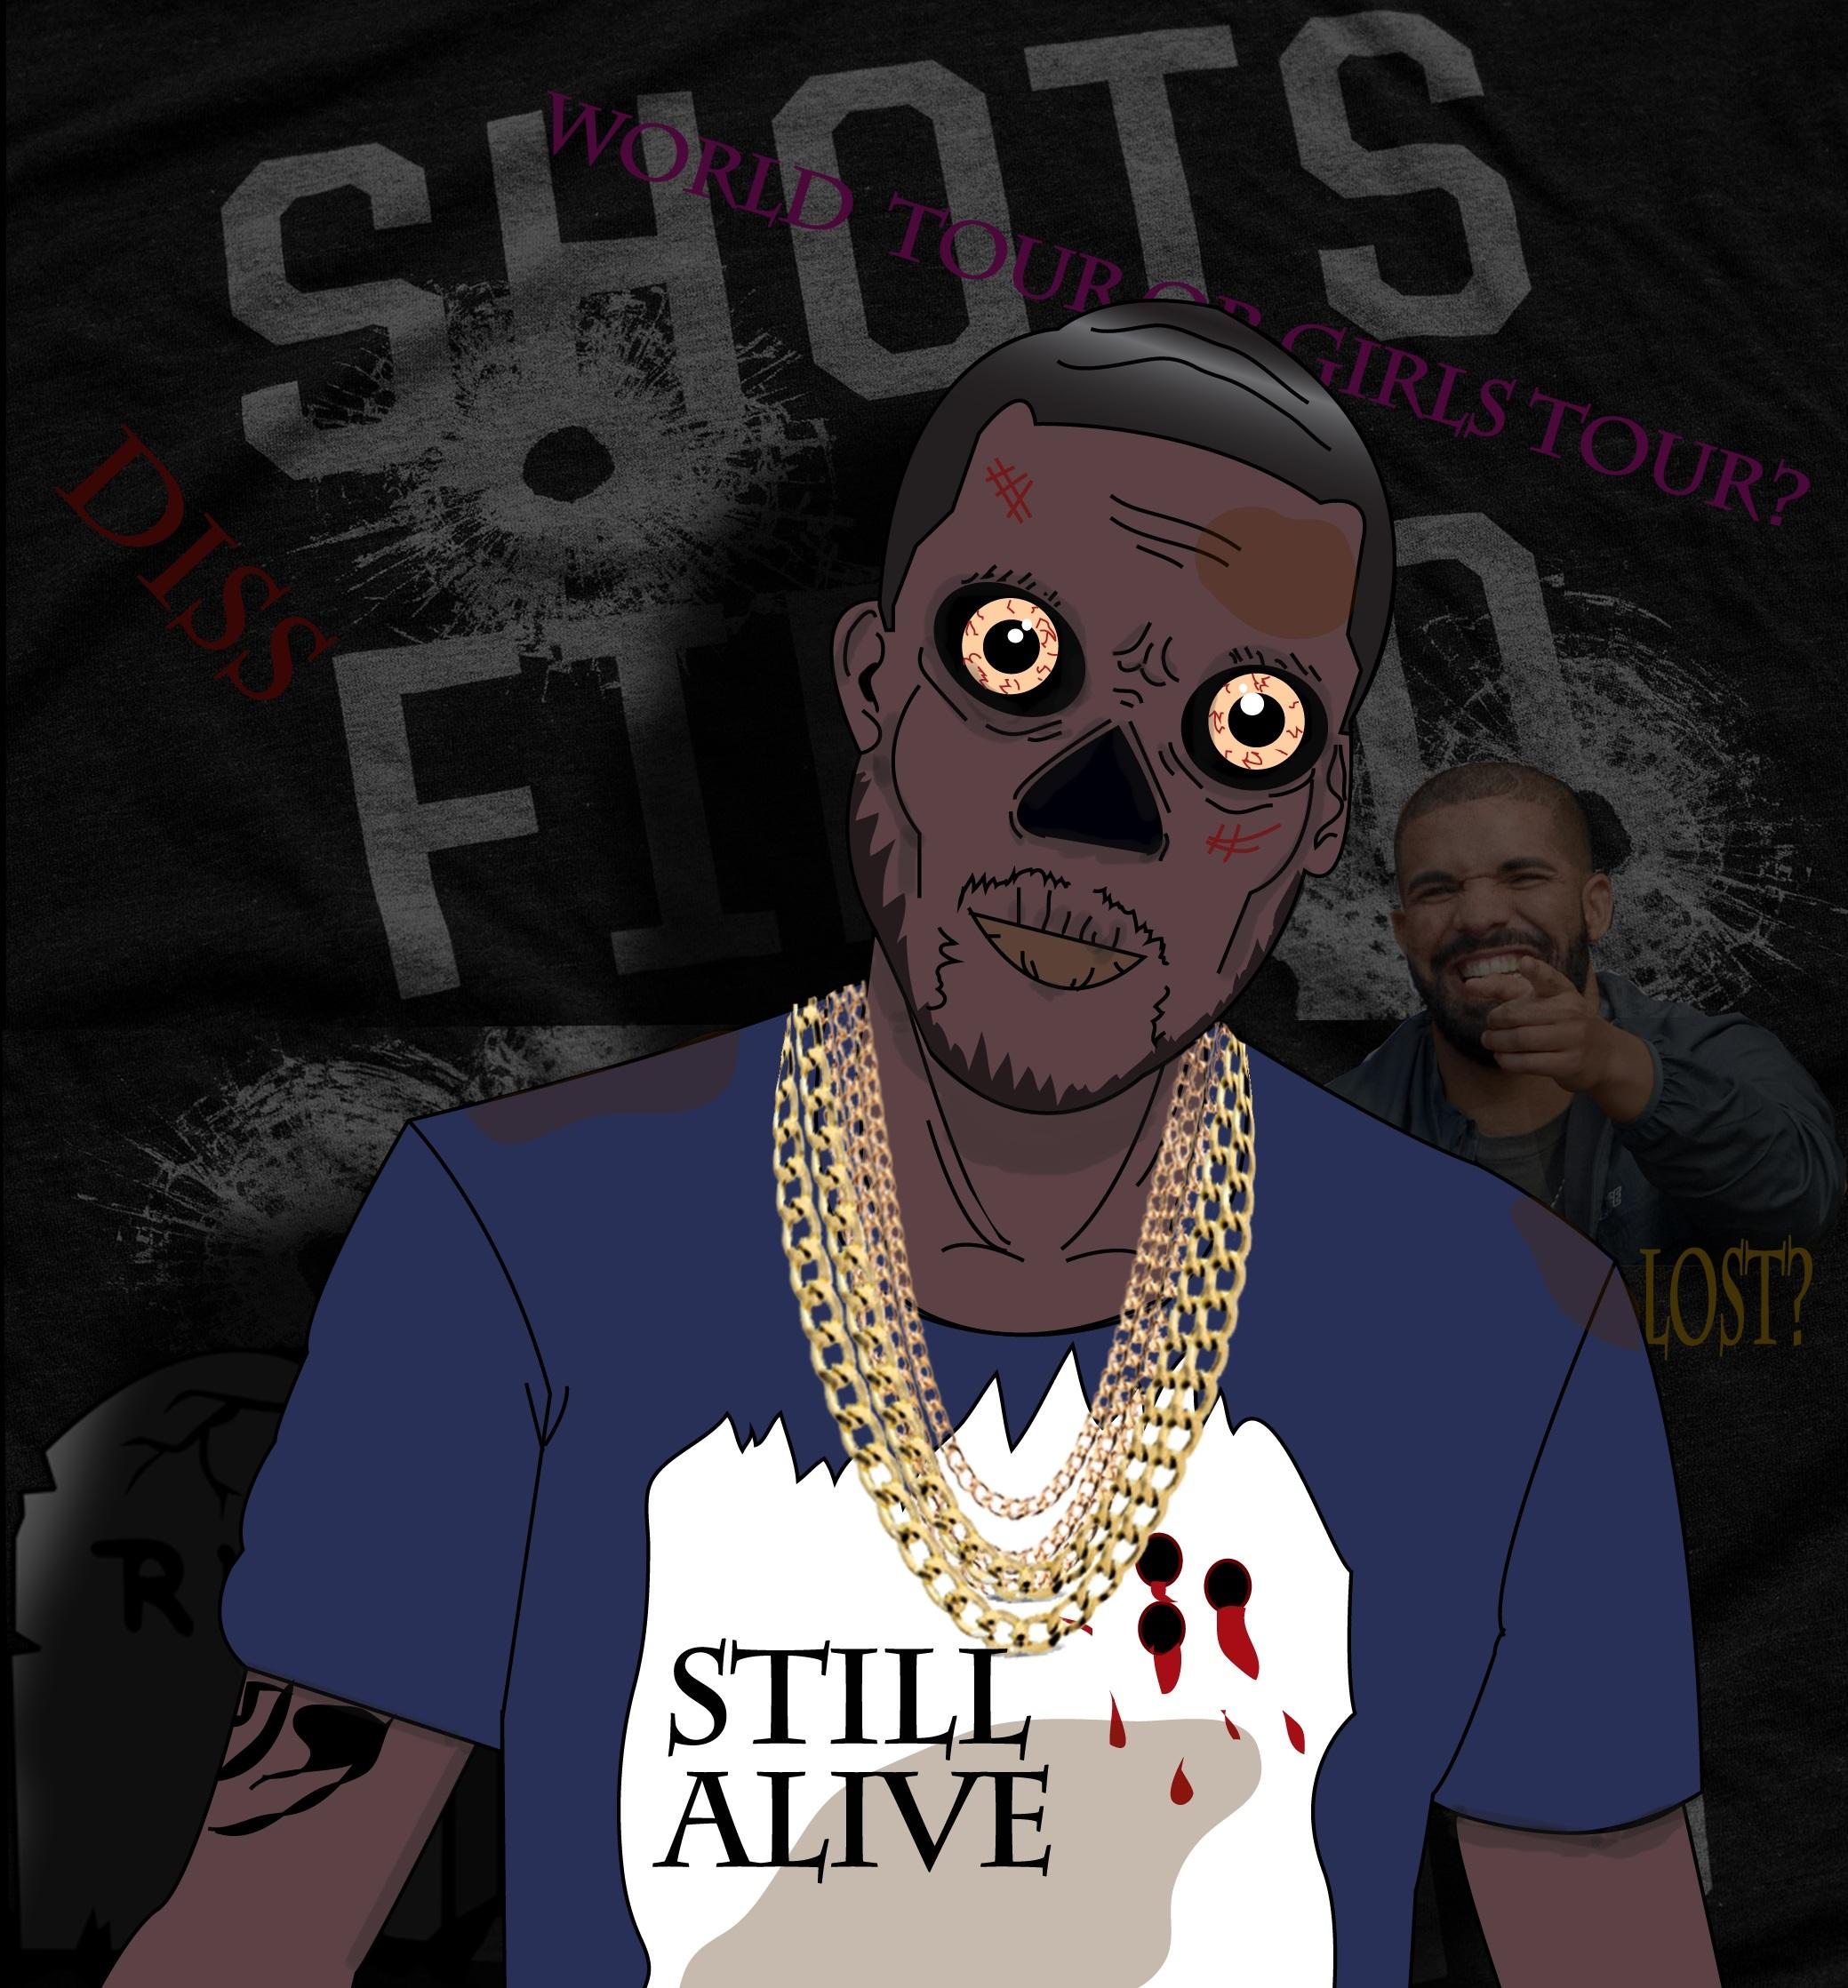 Gambar Rapper Zombie Fiksi Ilustrasi Poster Gambar Kartun